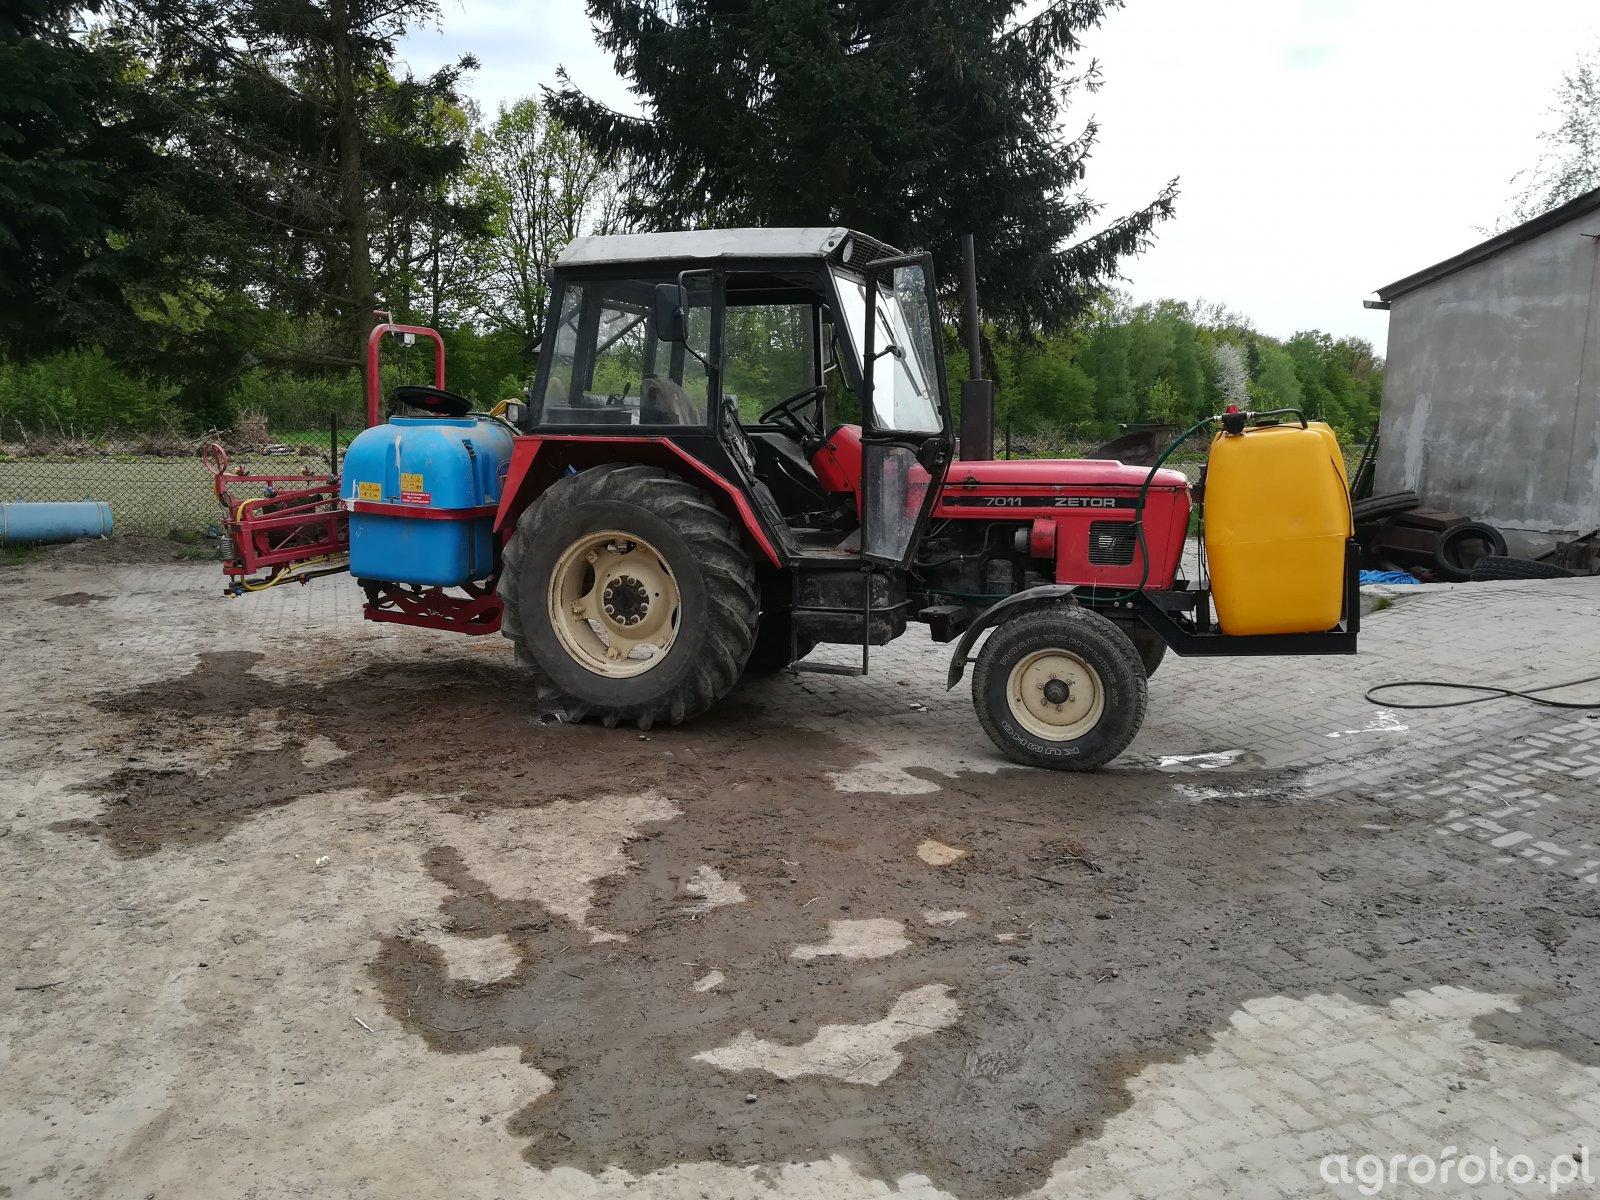 Zetor 7011 zbiornik na wode 400l i birdzik 800l